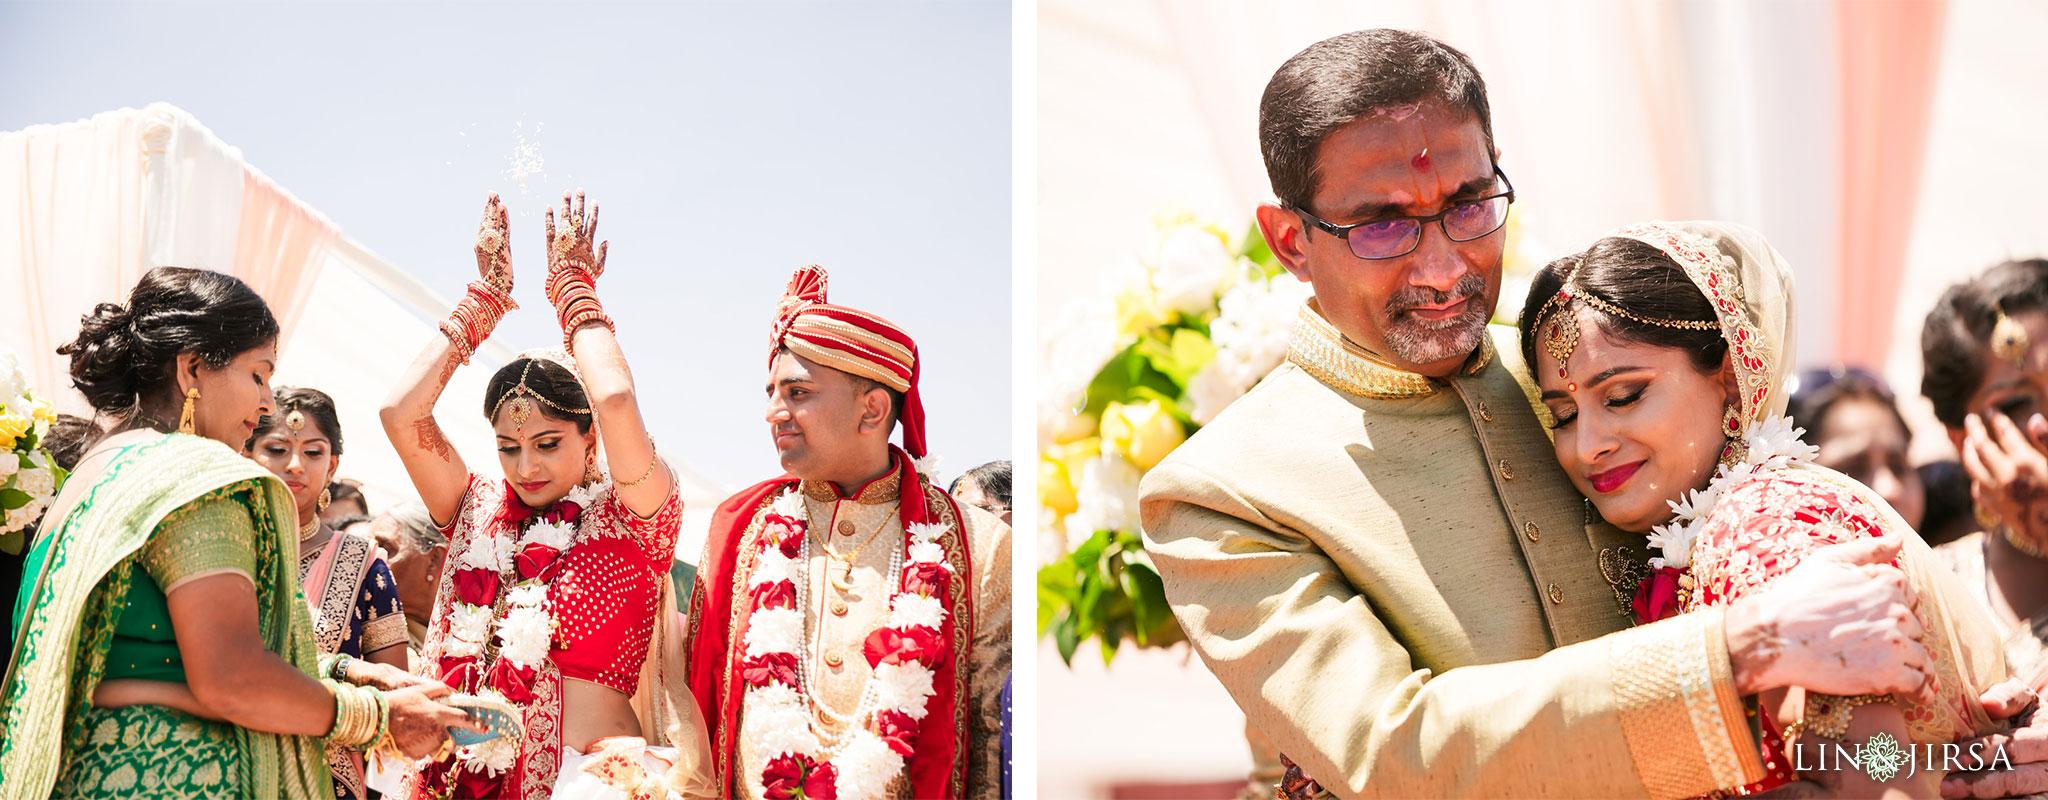 092 BAPS Swaminarayan Sanstha Chino Hills Indian Wedding Photography